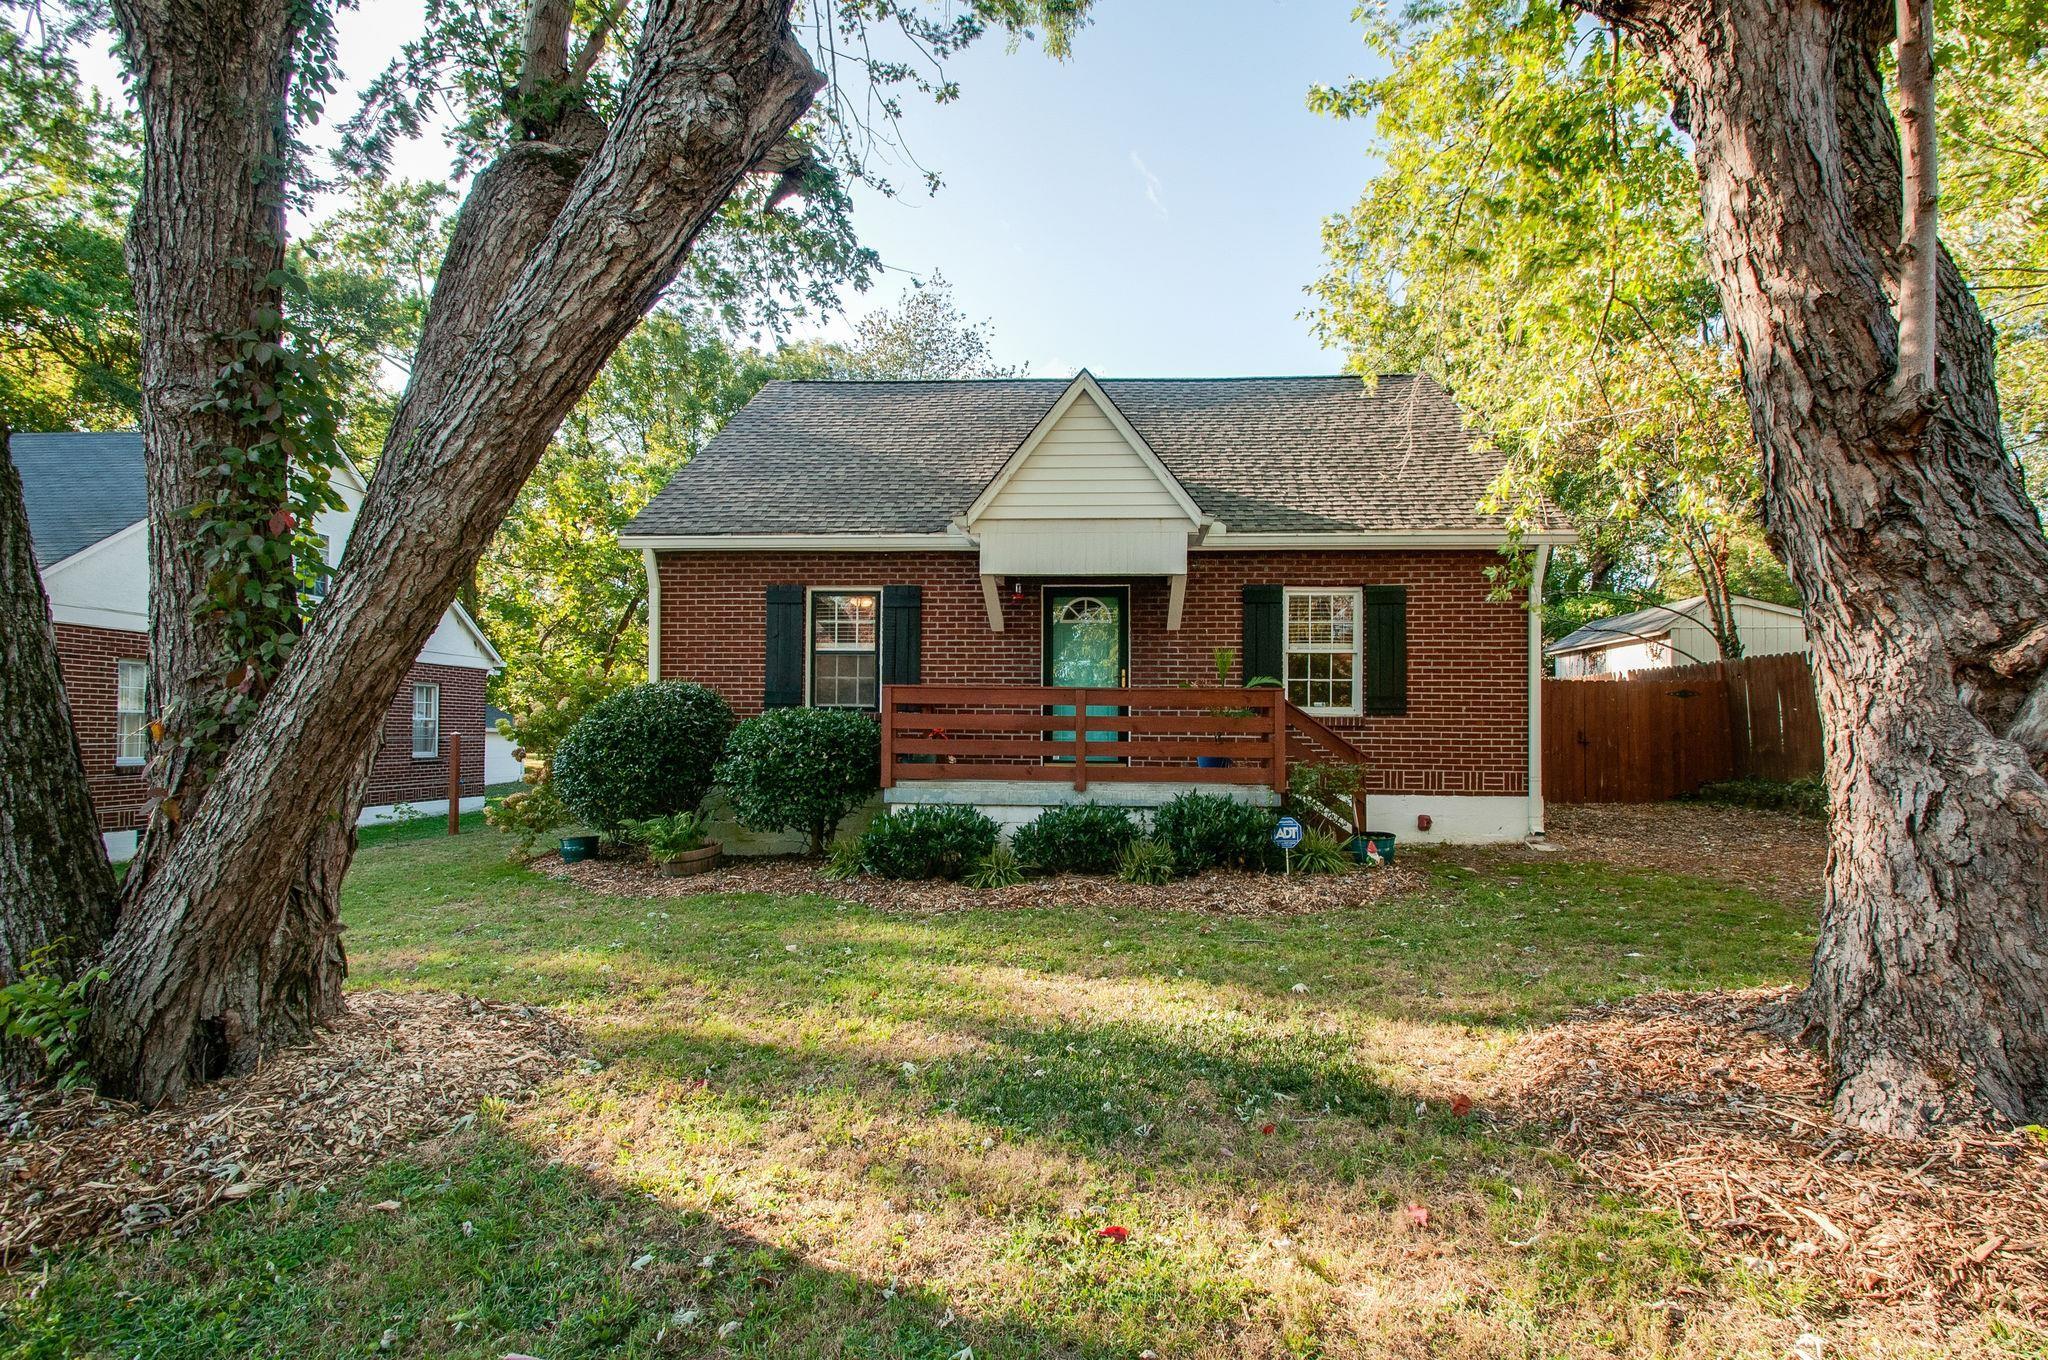 4205 Kennedy Ave, Nashville, TN 37216 - Nashville, TN real estate listing